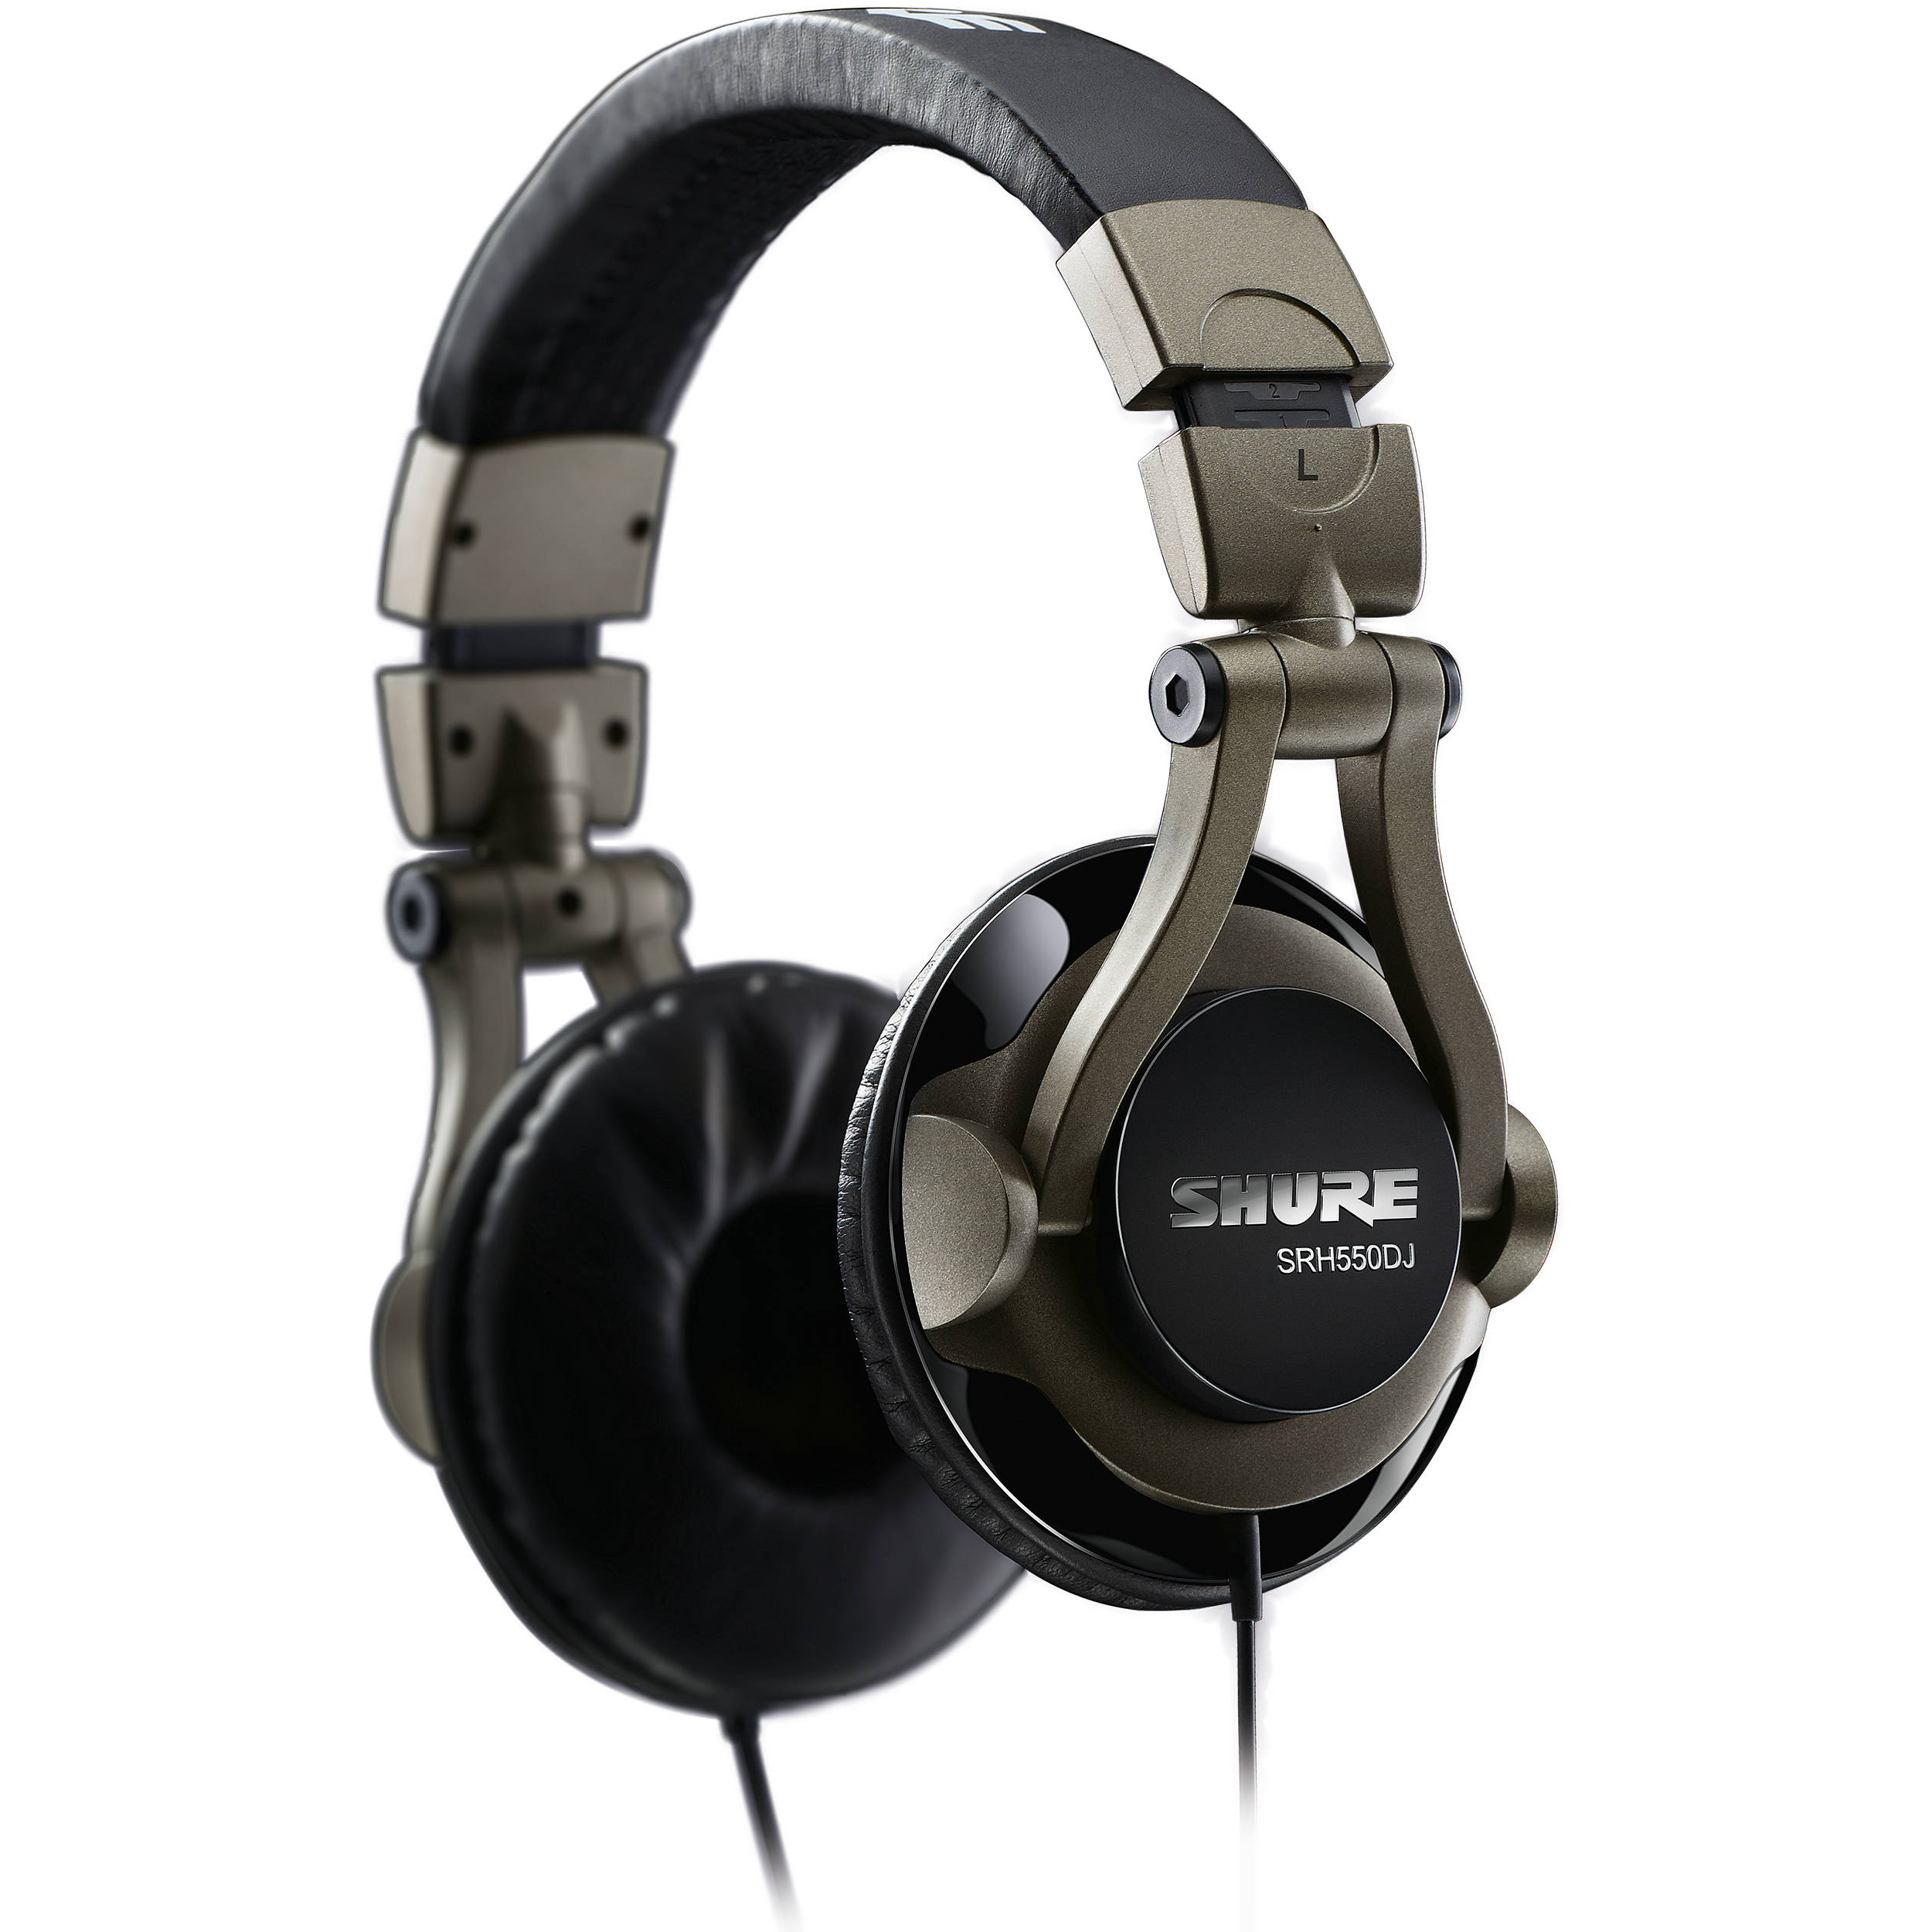 Shure SRH550DJ Professional Quality DJ Headphones SRH550DJ B H 82ed1a8928be1